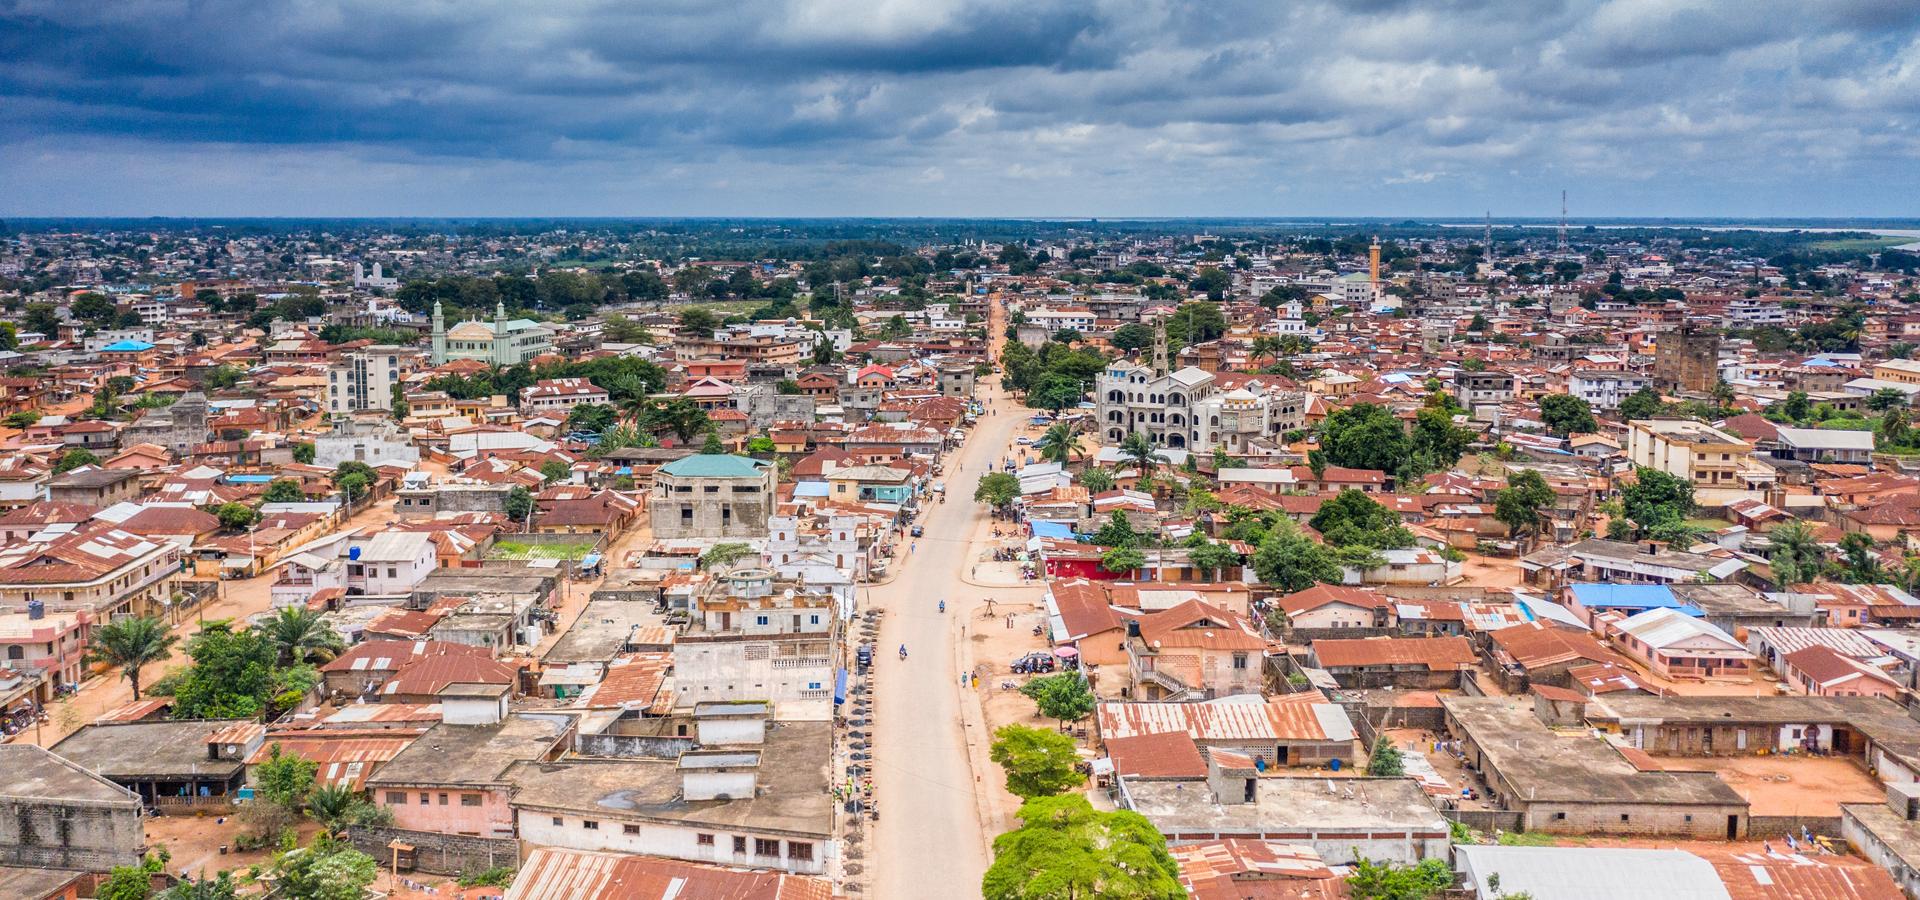 Peer-to-peer advisory in Porto-Novo, Ouémé Department, Benin